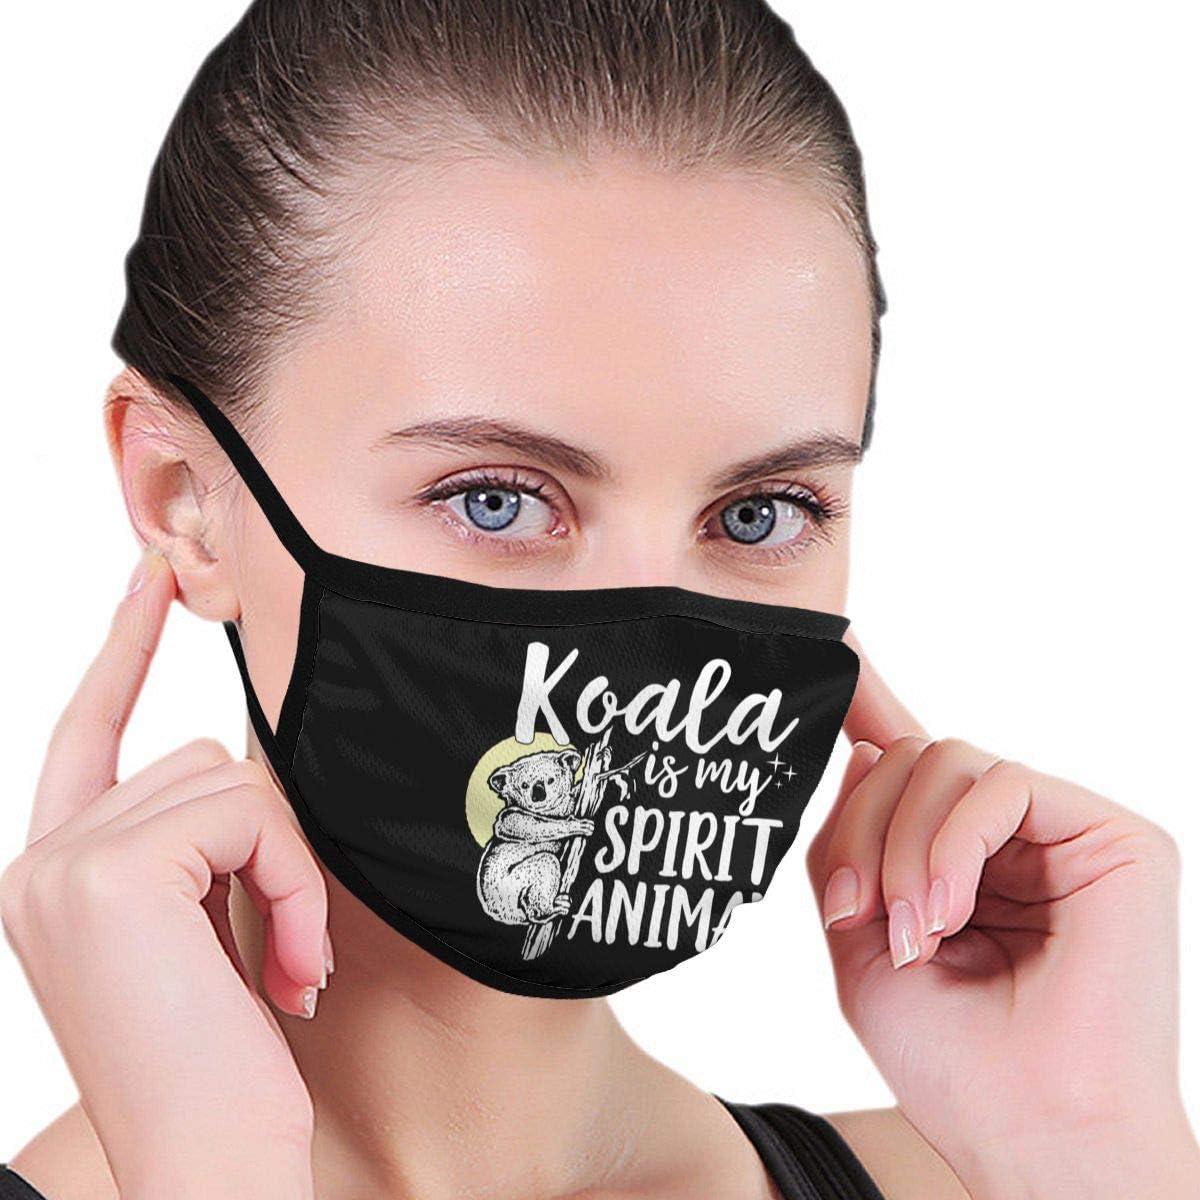 Not Koala Is My Spirit - Funda para la nariz de animal, antipolvo, reutilizable, fibra de poliéster, negro, talla única